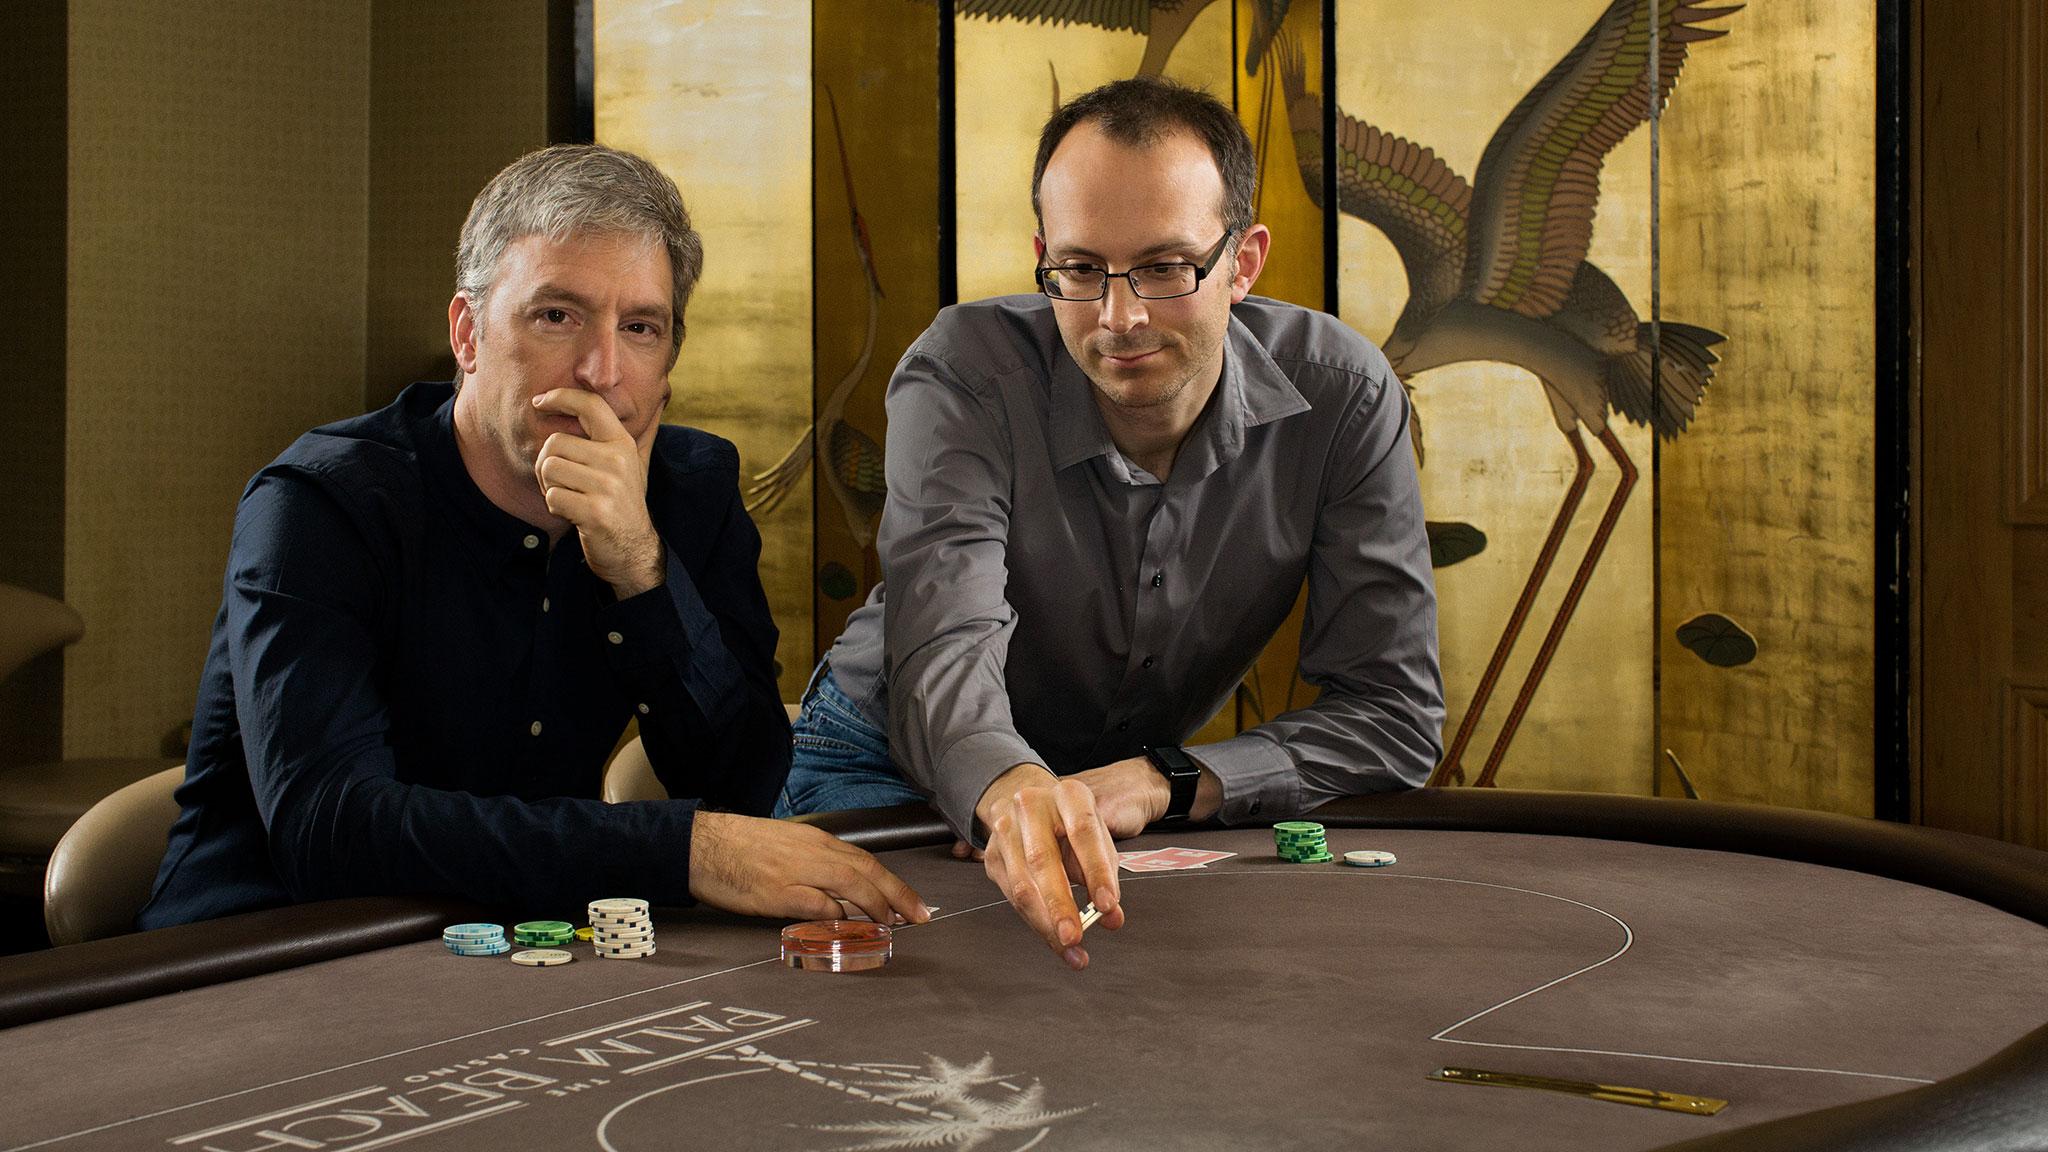 Poker With Steven Levitt Financial Times